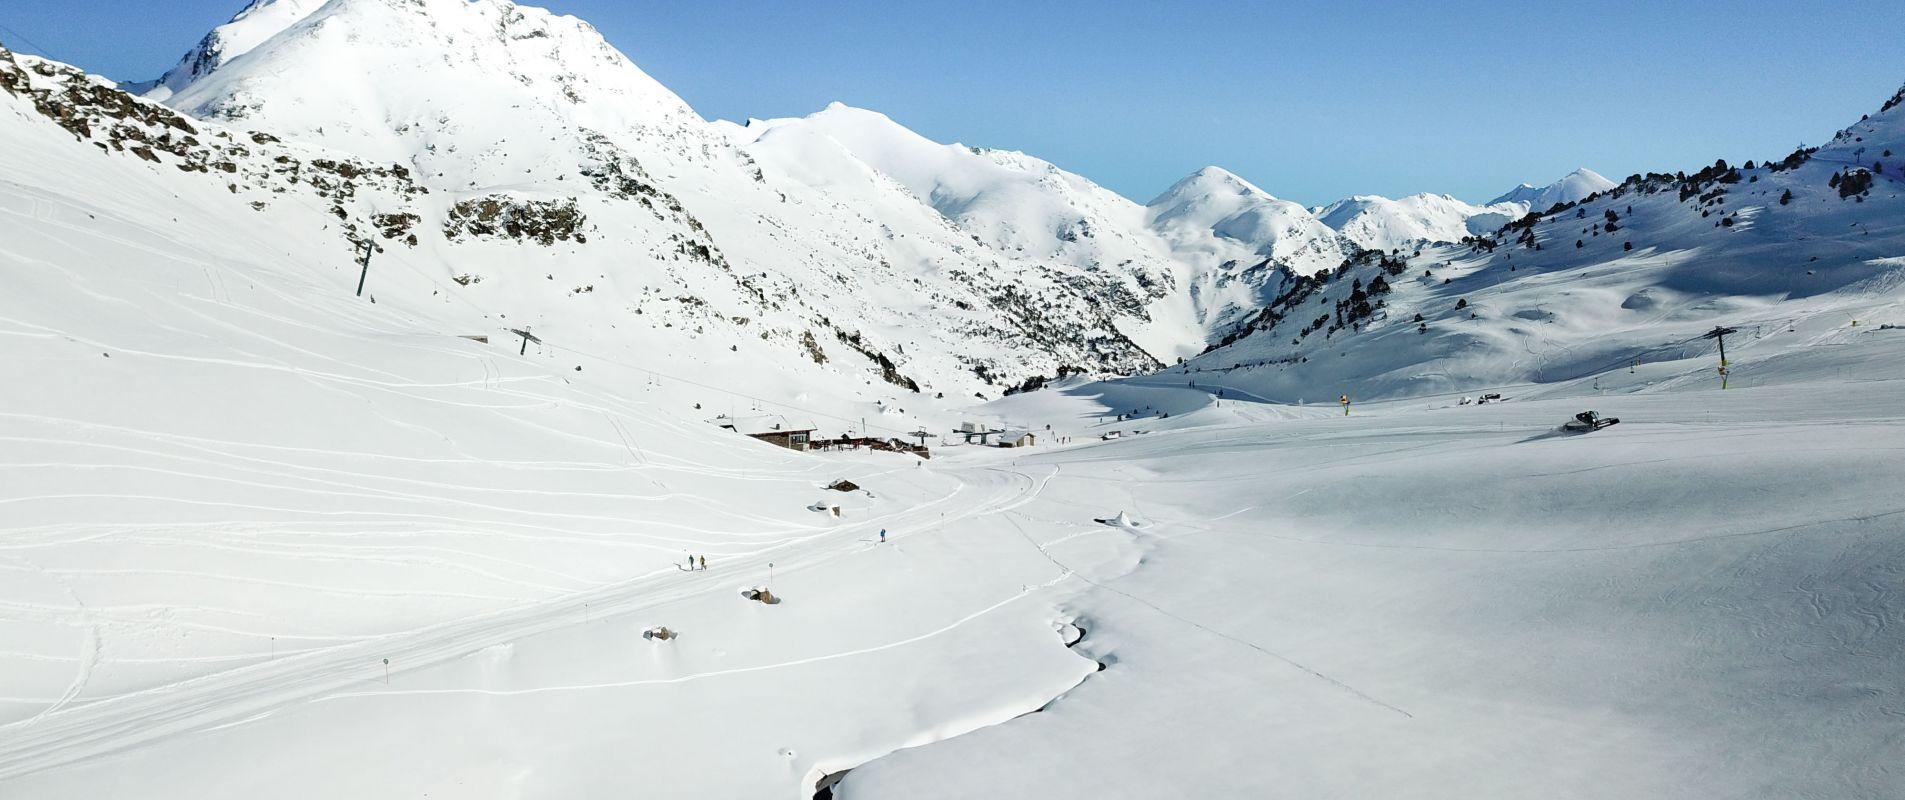 Ordino-Arcalís ski resort